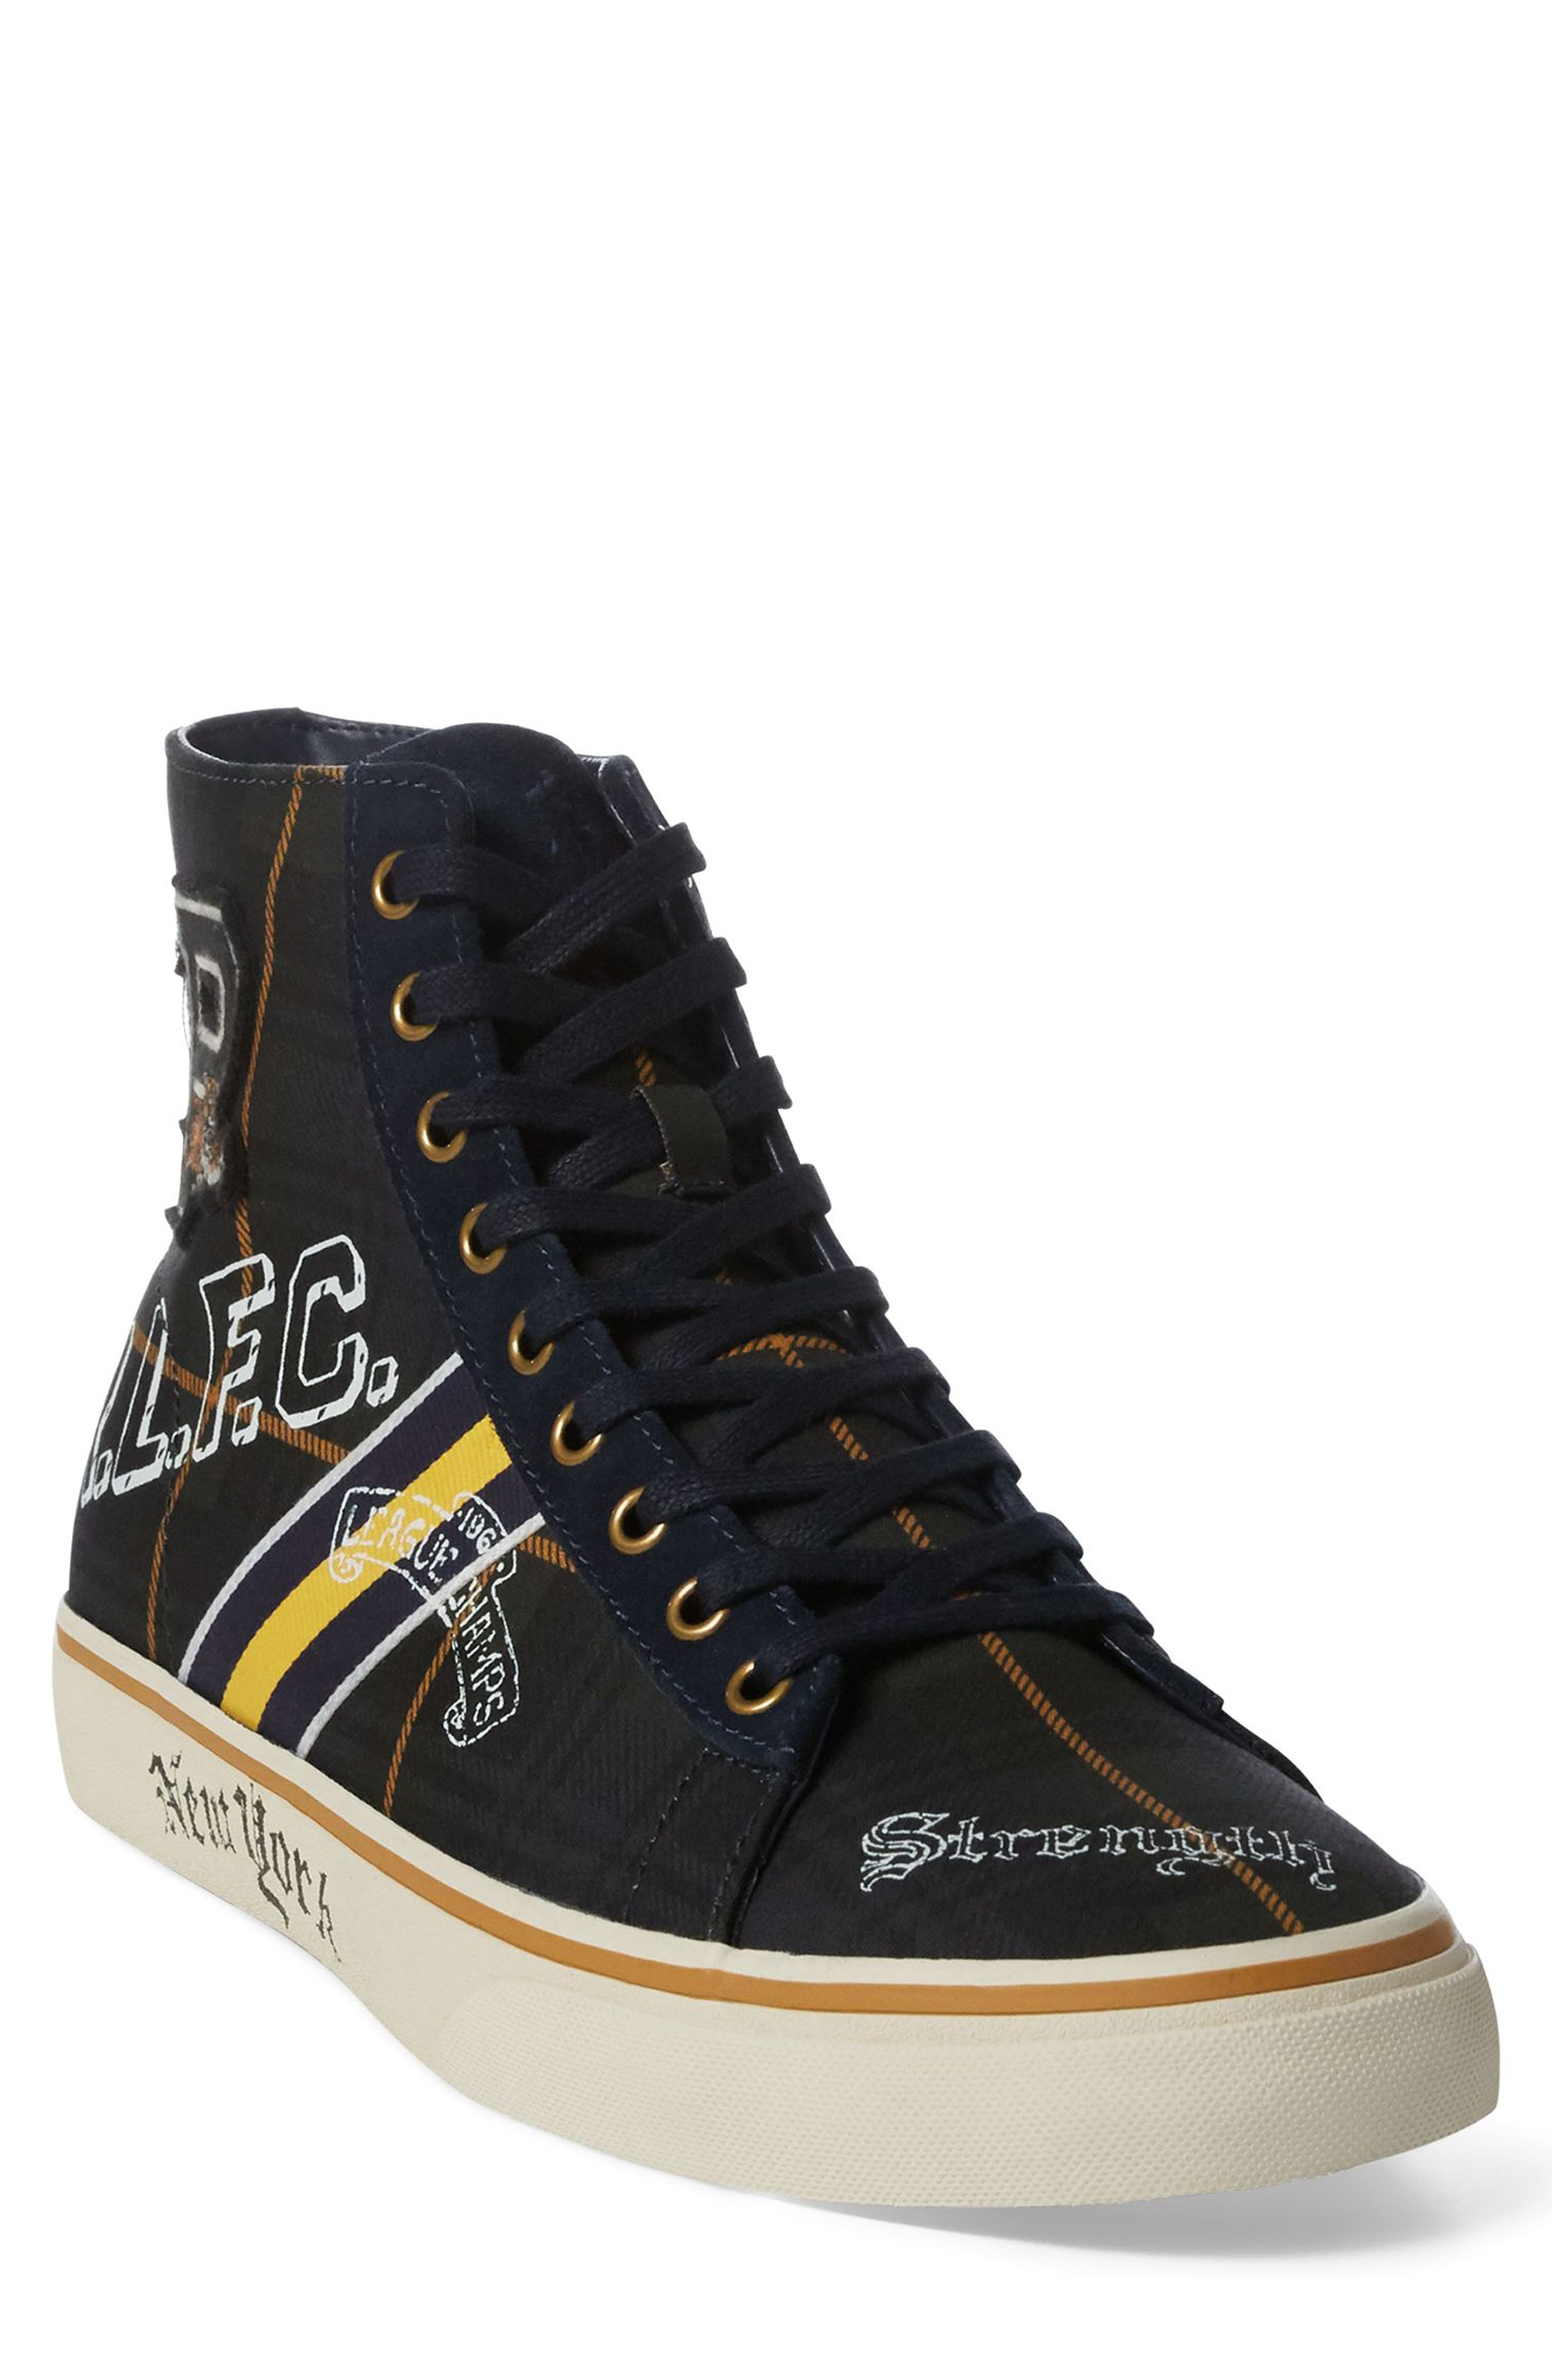 Polo Ralph Lauren Solomon Ii Sneaker - Black